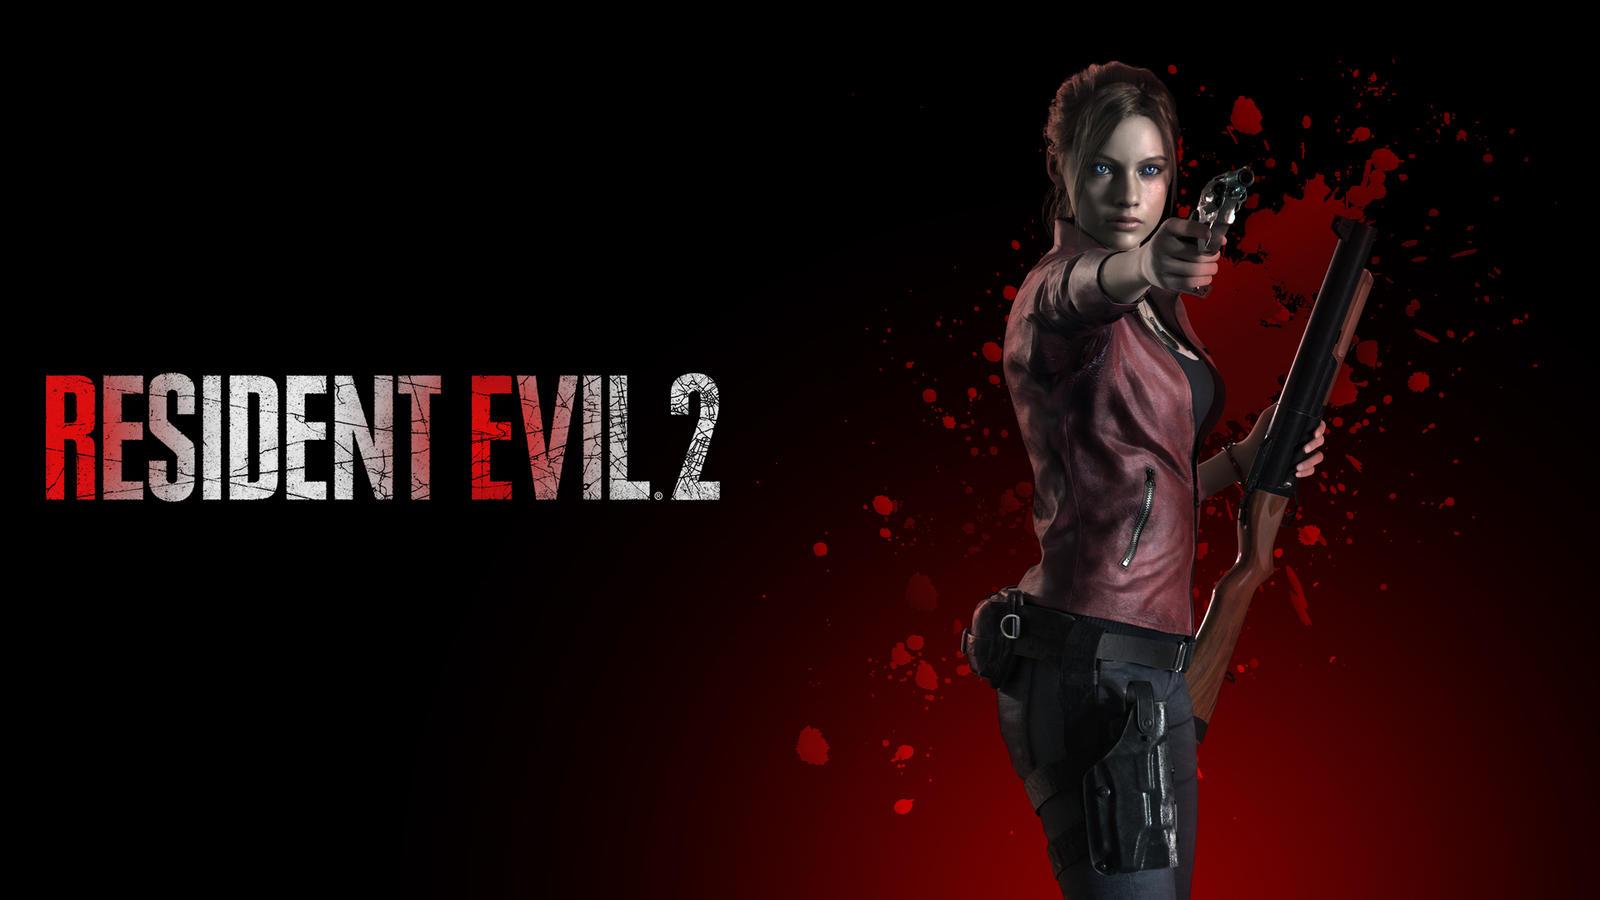 Download Resident Evil 2 Wallpaper 1920X1080 Background